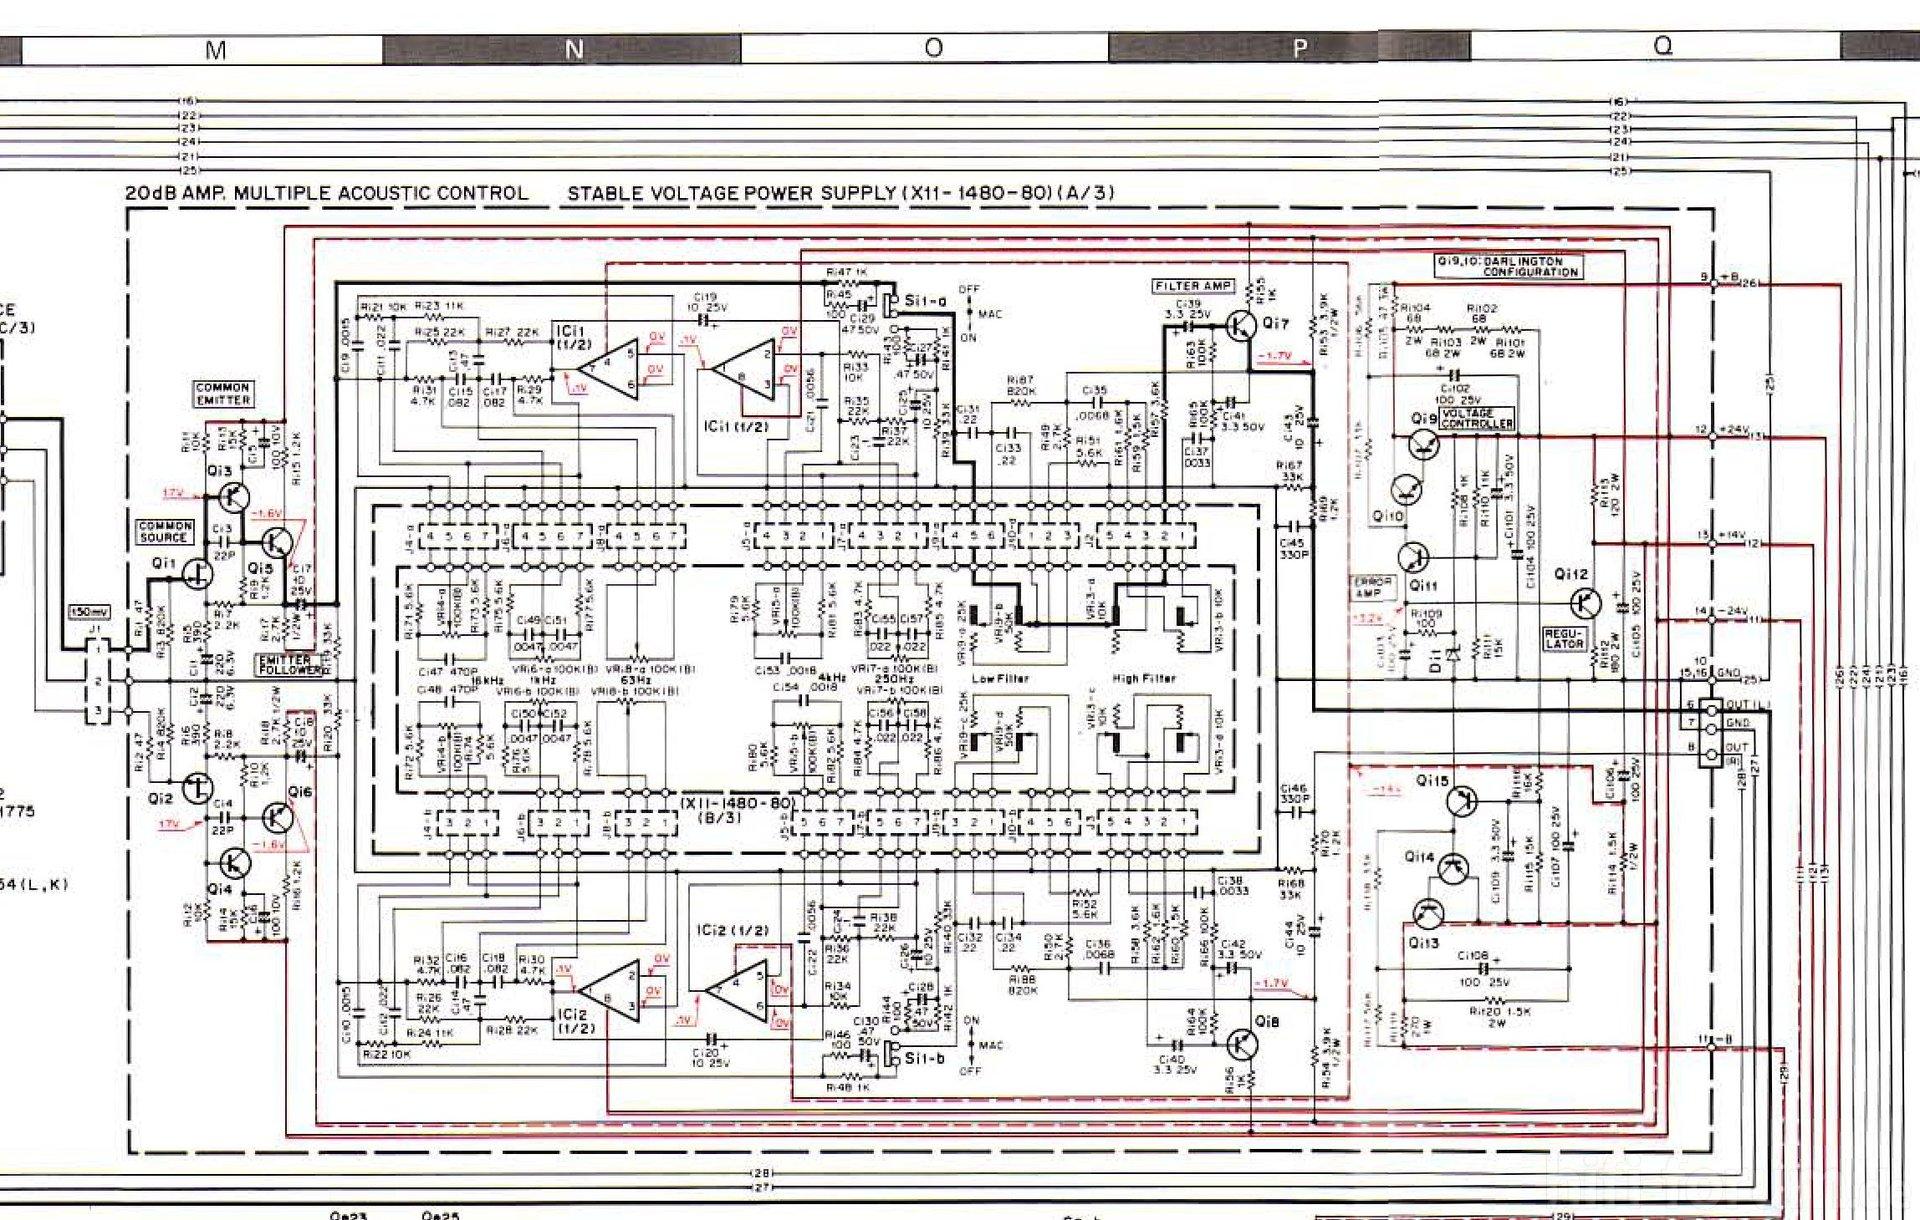 Fantastisch Equalizer System Schaltplan Ideen - Verdrahtungsideen ...